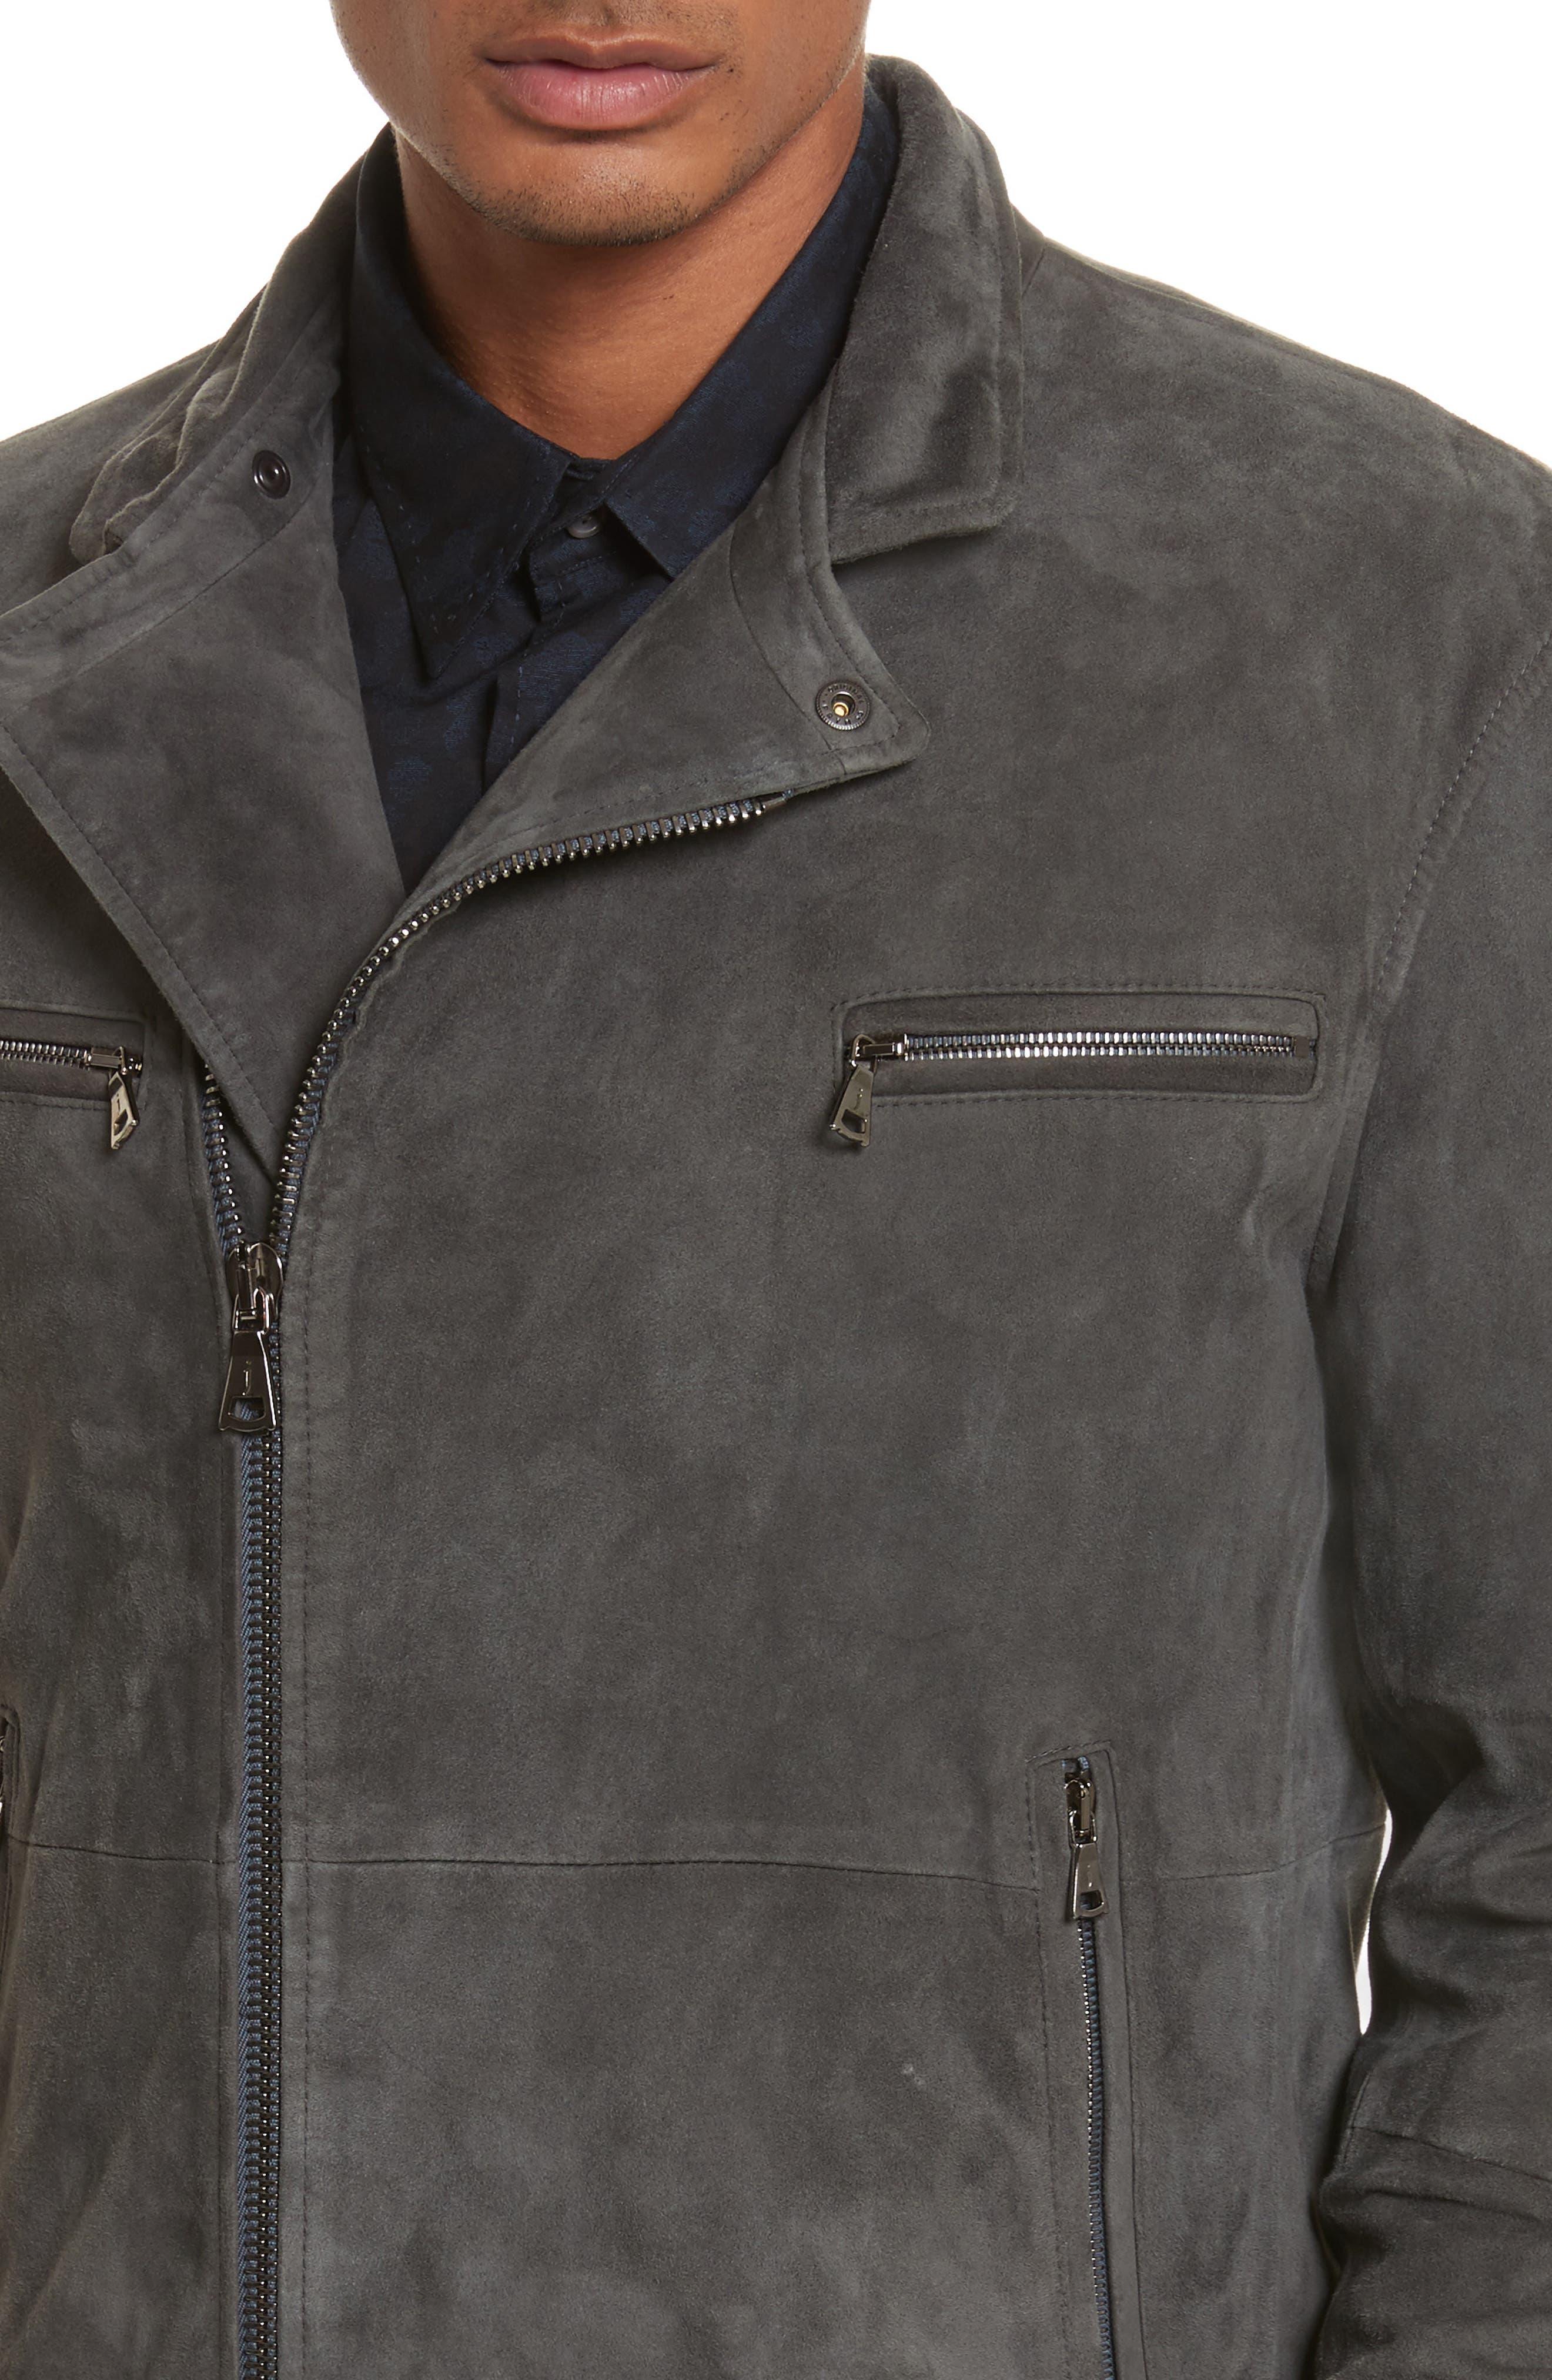 John Varvatos Suede Moto Jacket,                             Alternate thumbnail 4, color,                             Typhon Grey